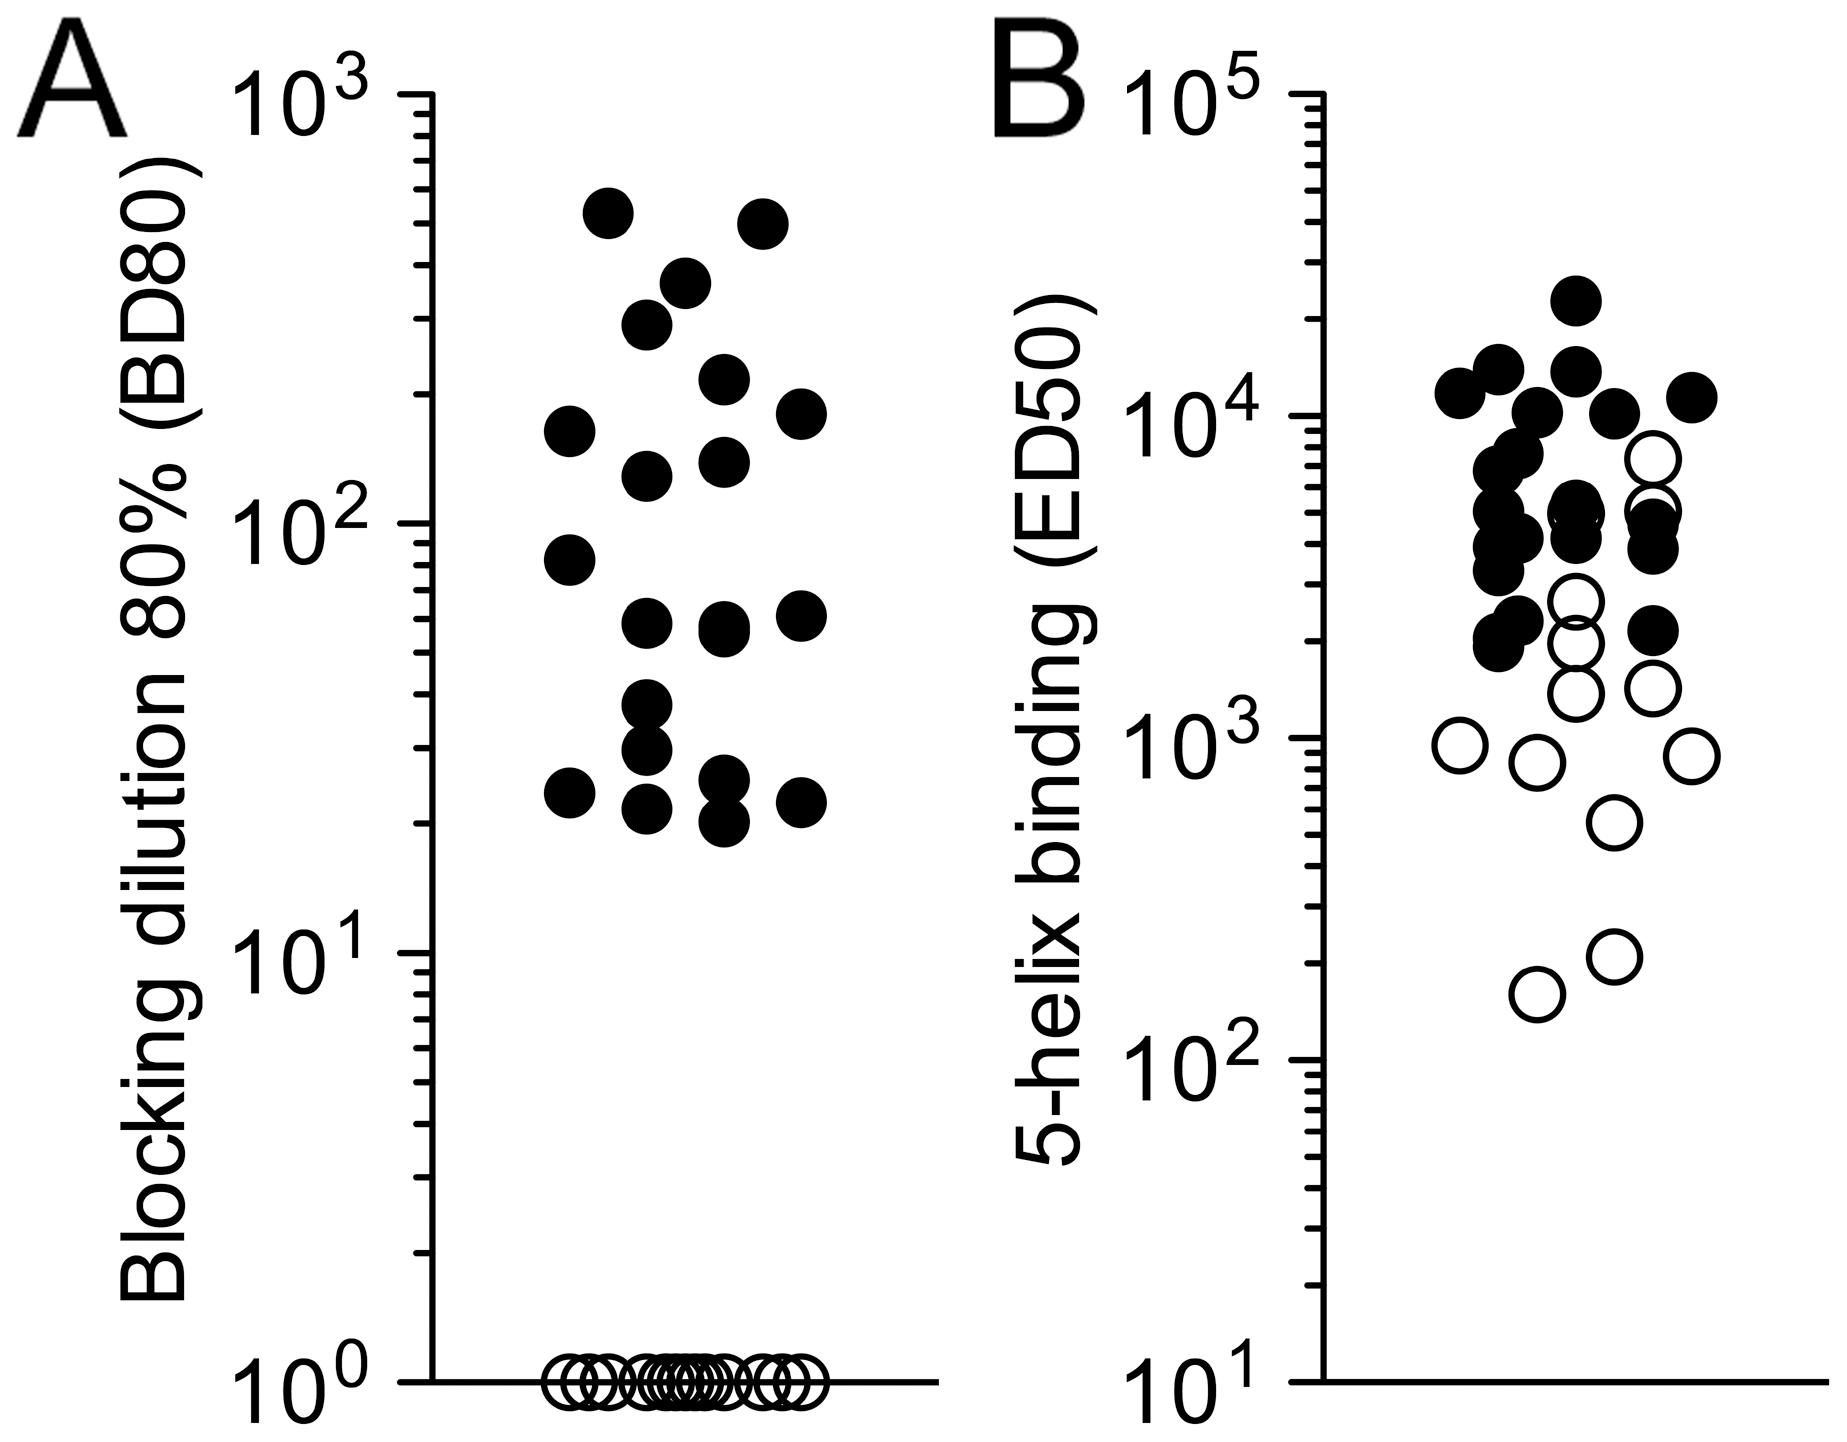 Detection of HK20-like antibodies in patient sera.